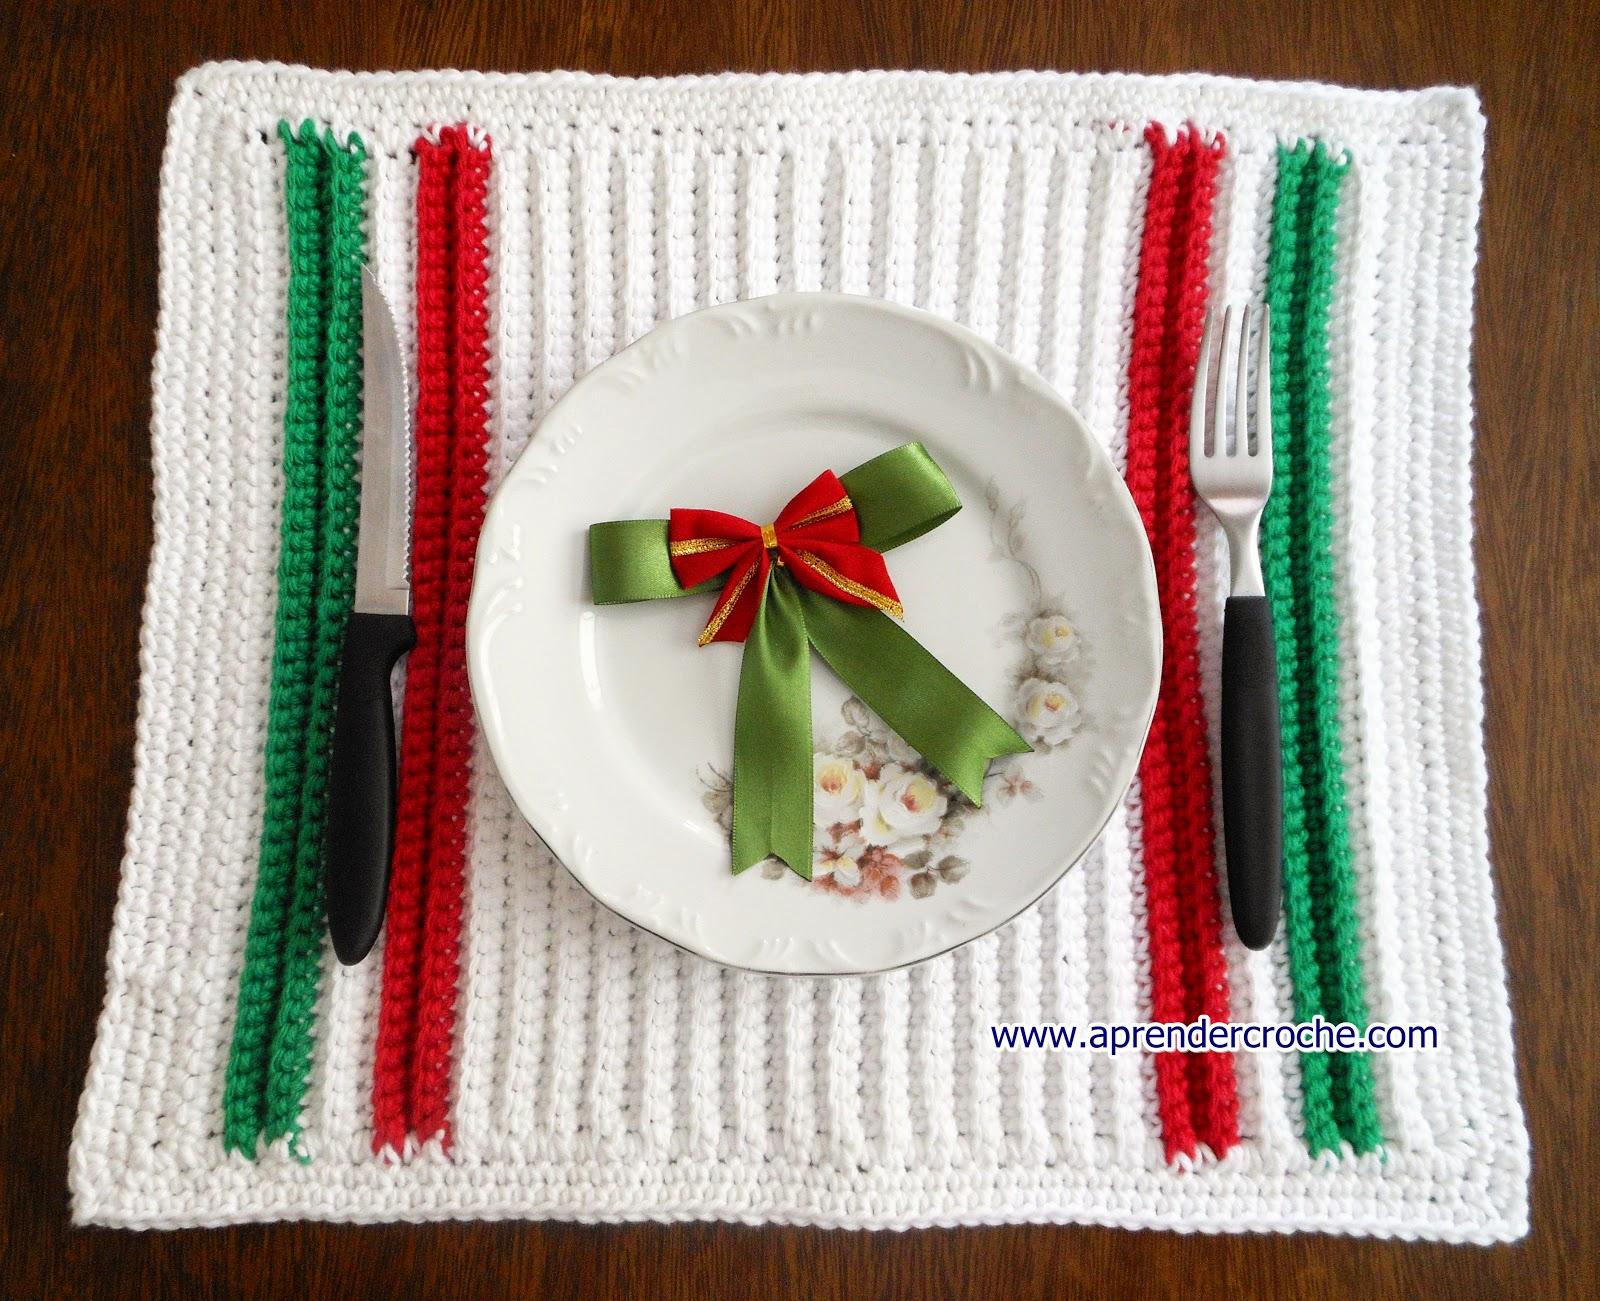 croche natal americanos aprender croche com edinir-croche mesa maxcolor pratos xicaras copos talheres réveillon dvd vermelho verde branco facebook loja frete gratis youtube